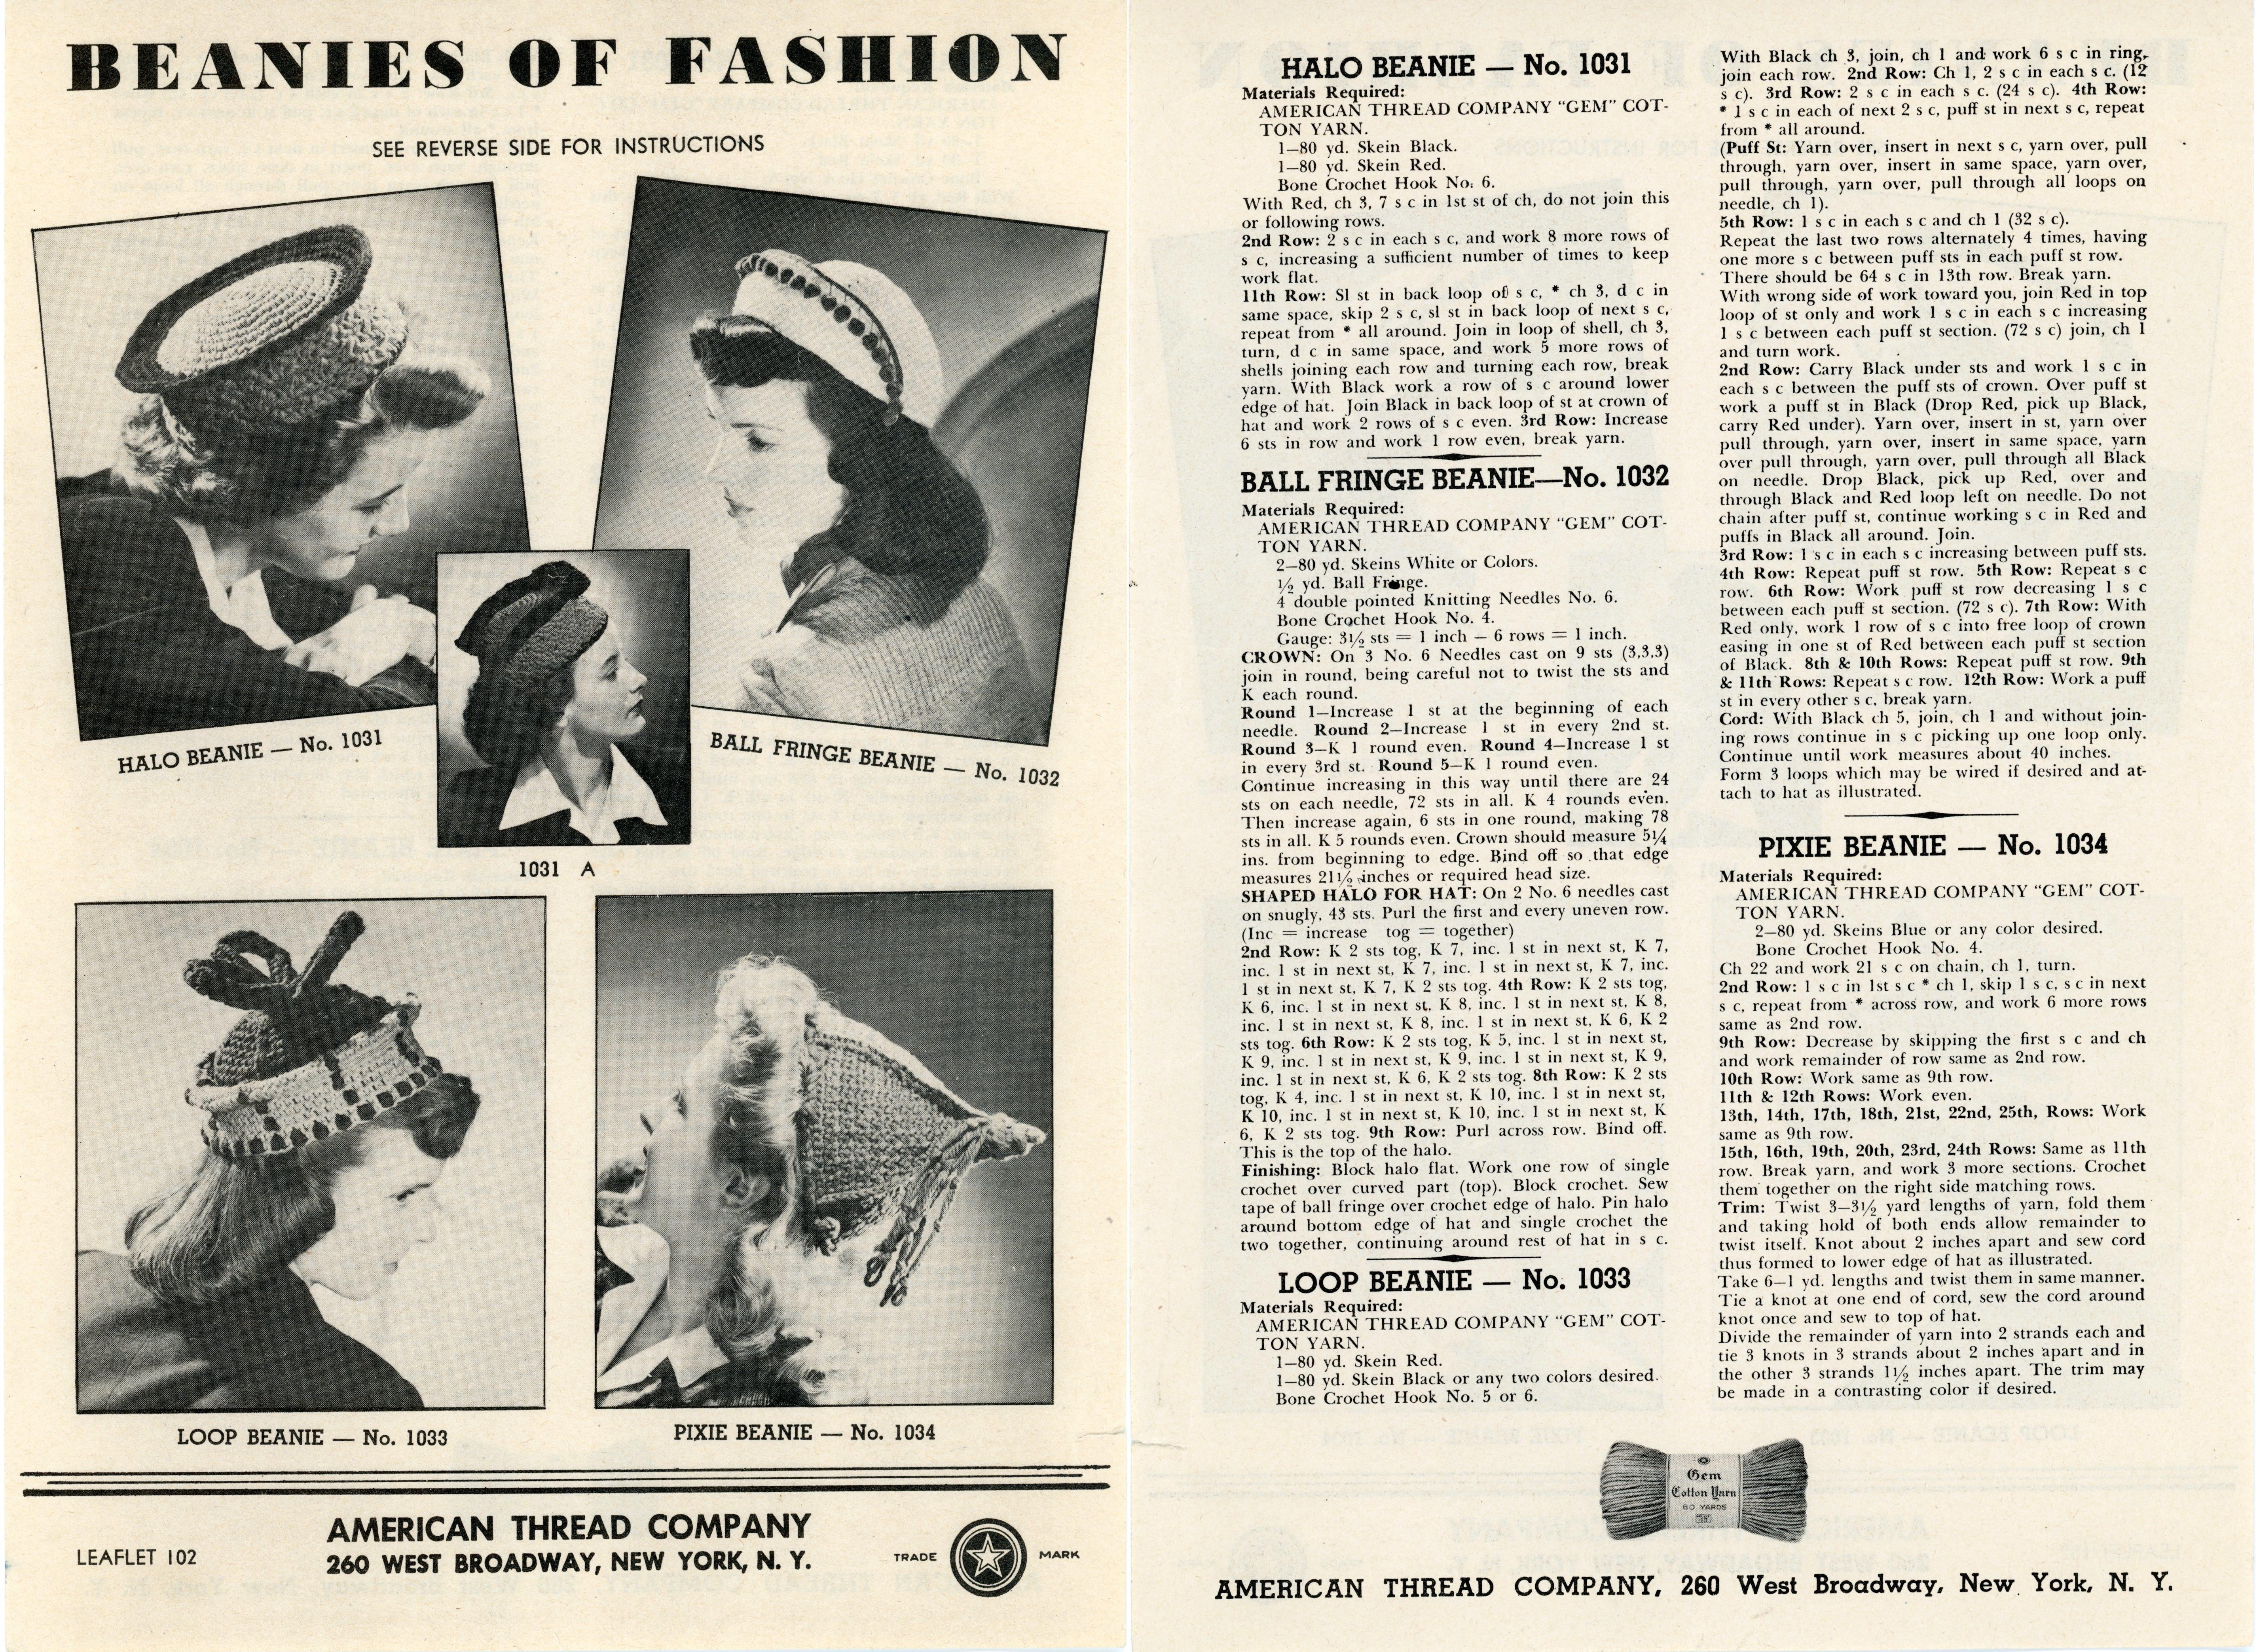 Beanies of Fashion